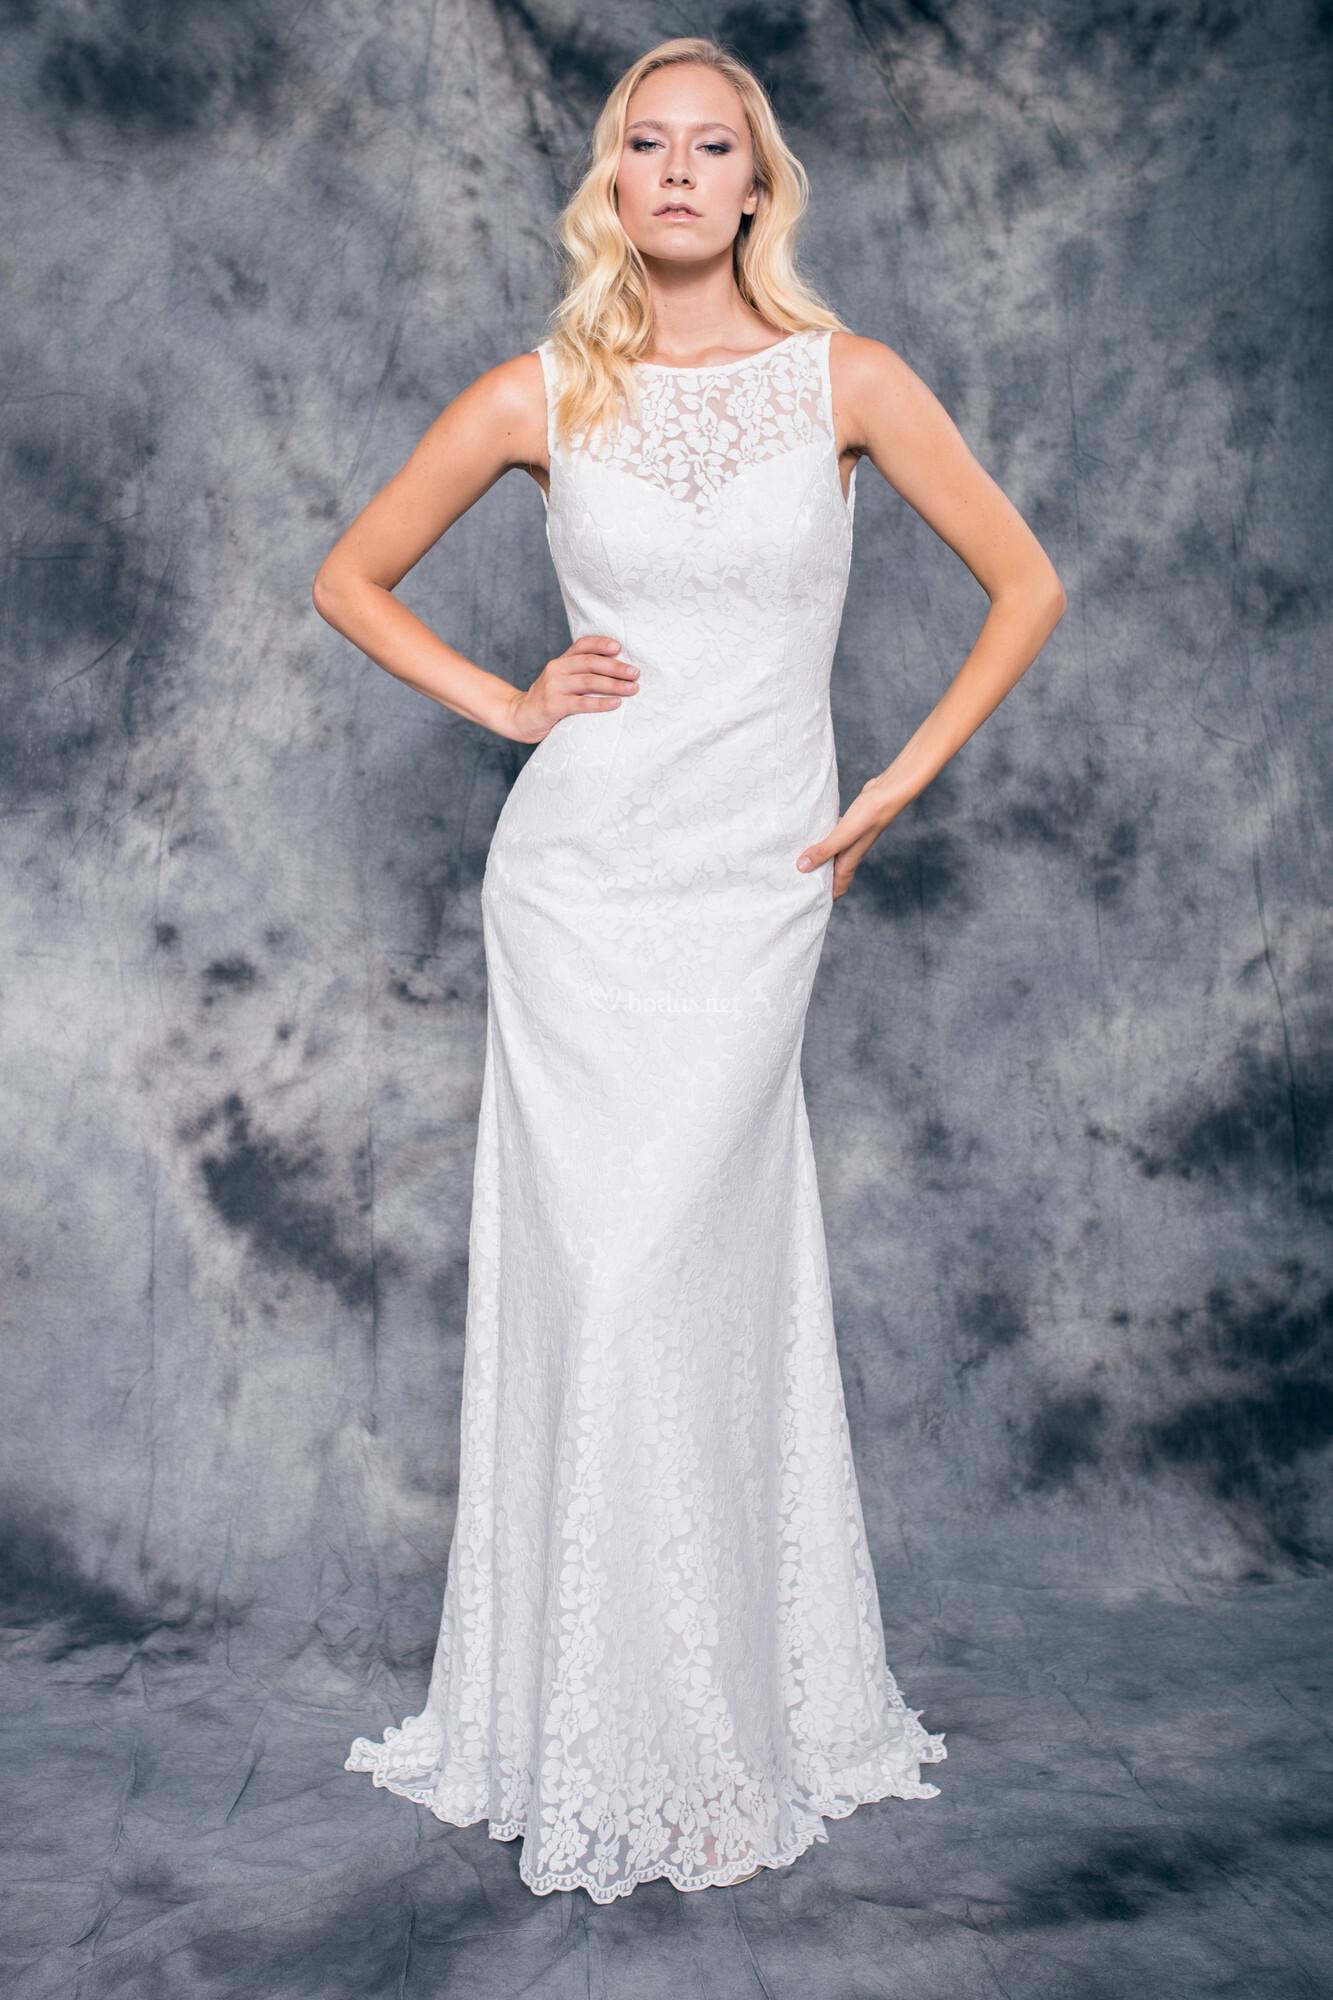 Vestidos corte sirena 2020 12